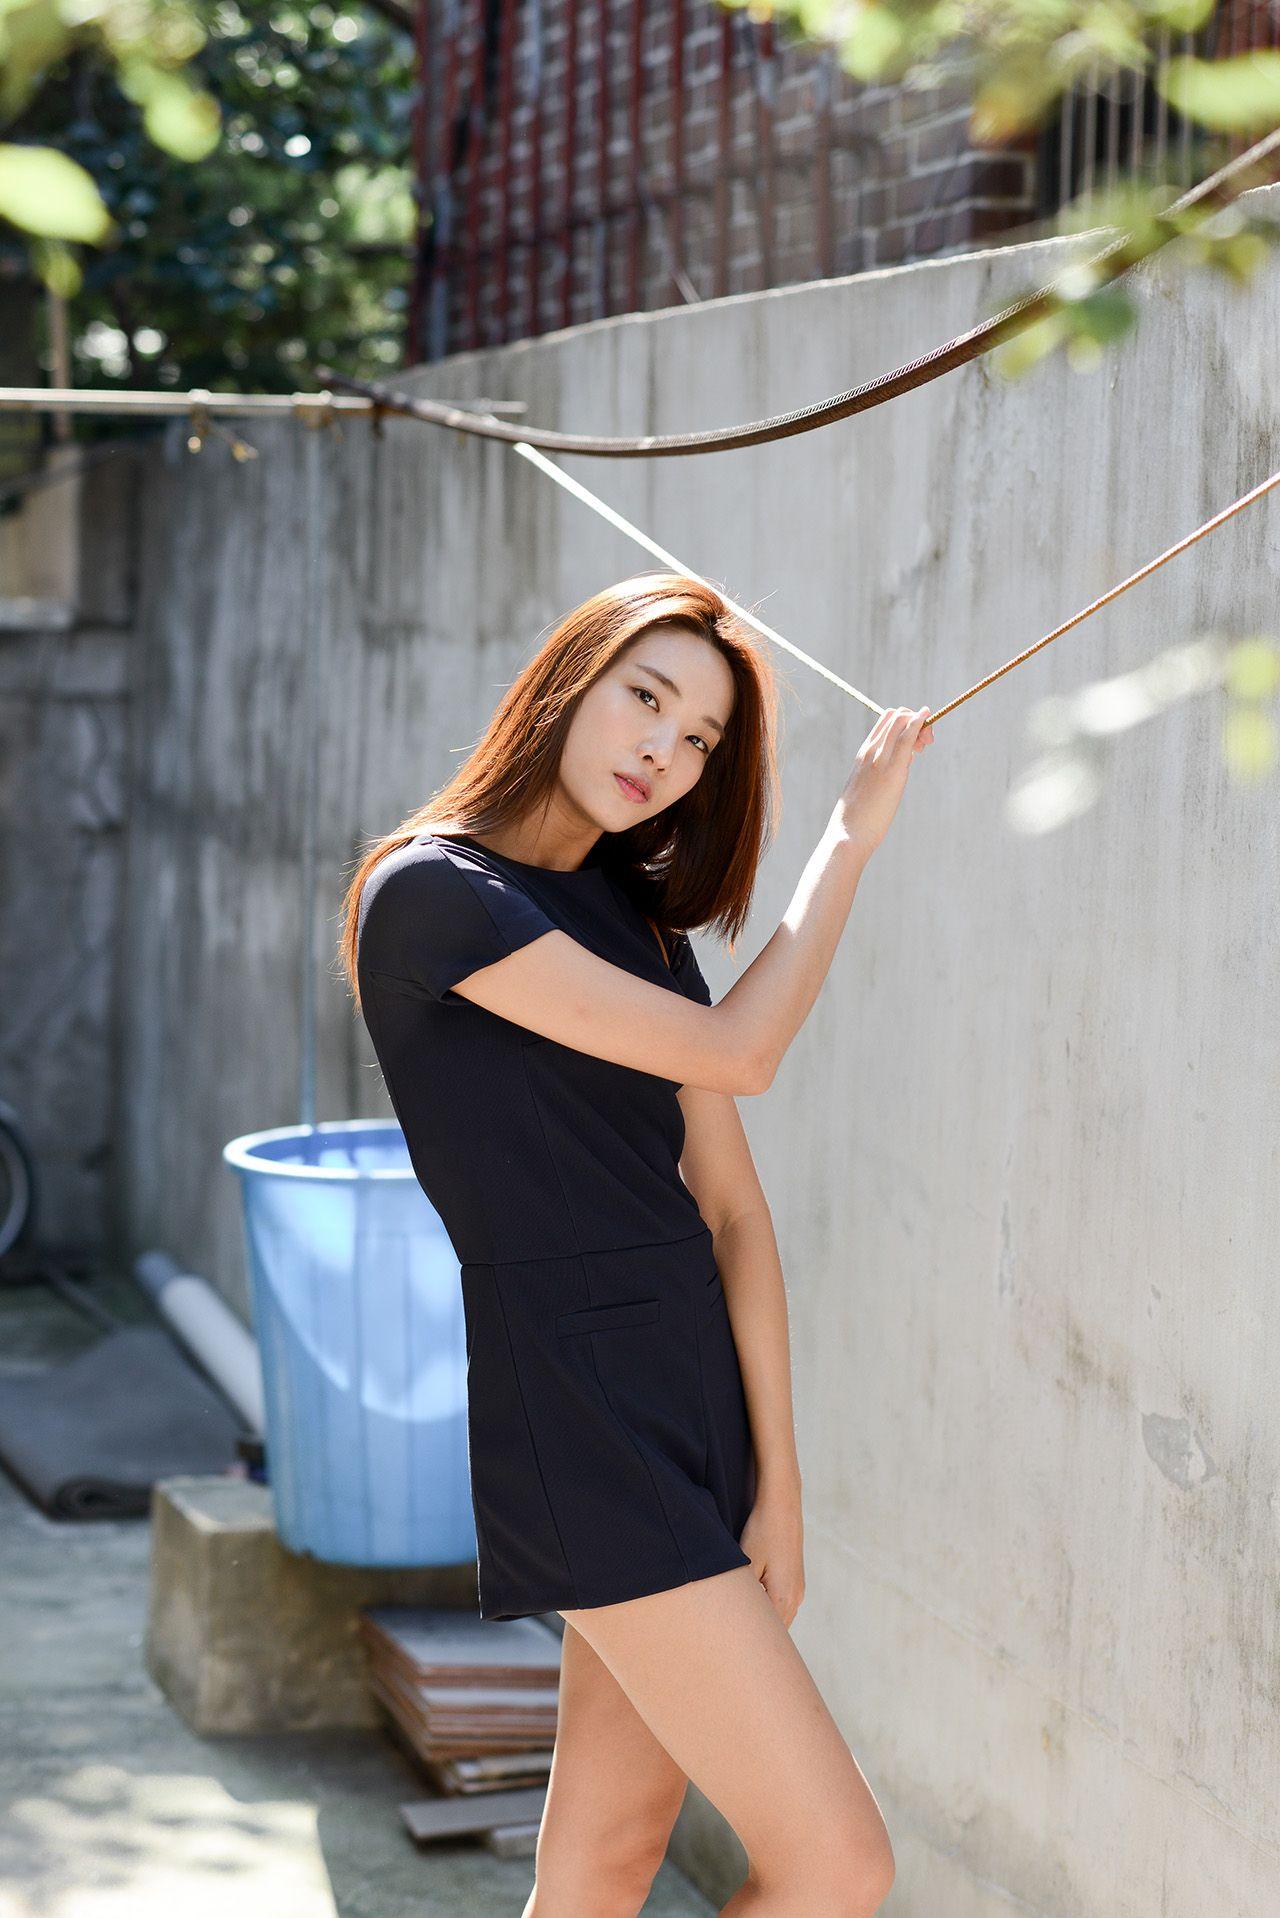 Instagram Com A Mavrin Check Models On My Insta: Koreanmodel: KOREANMODEL Street-style Project.Model : Lee